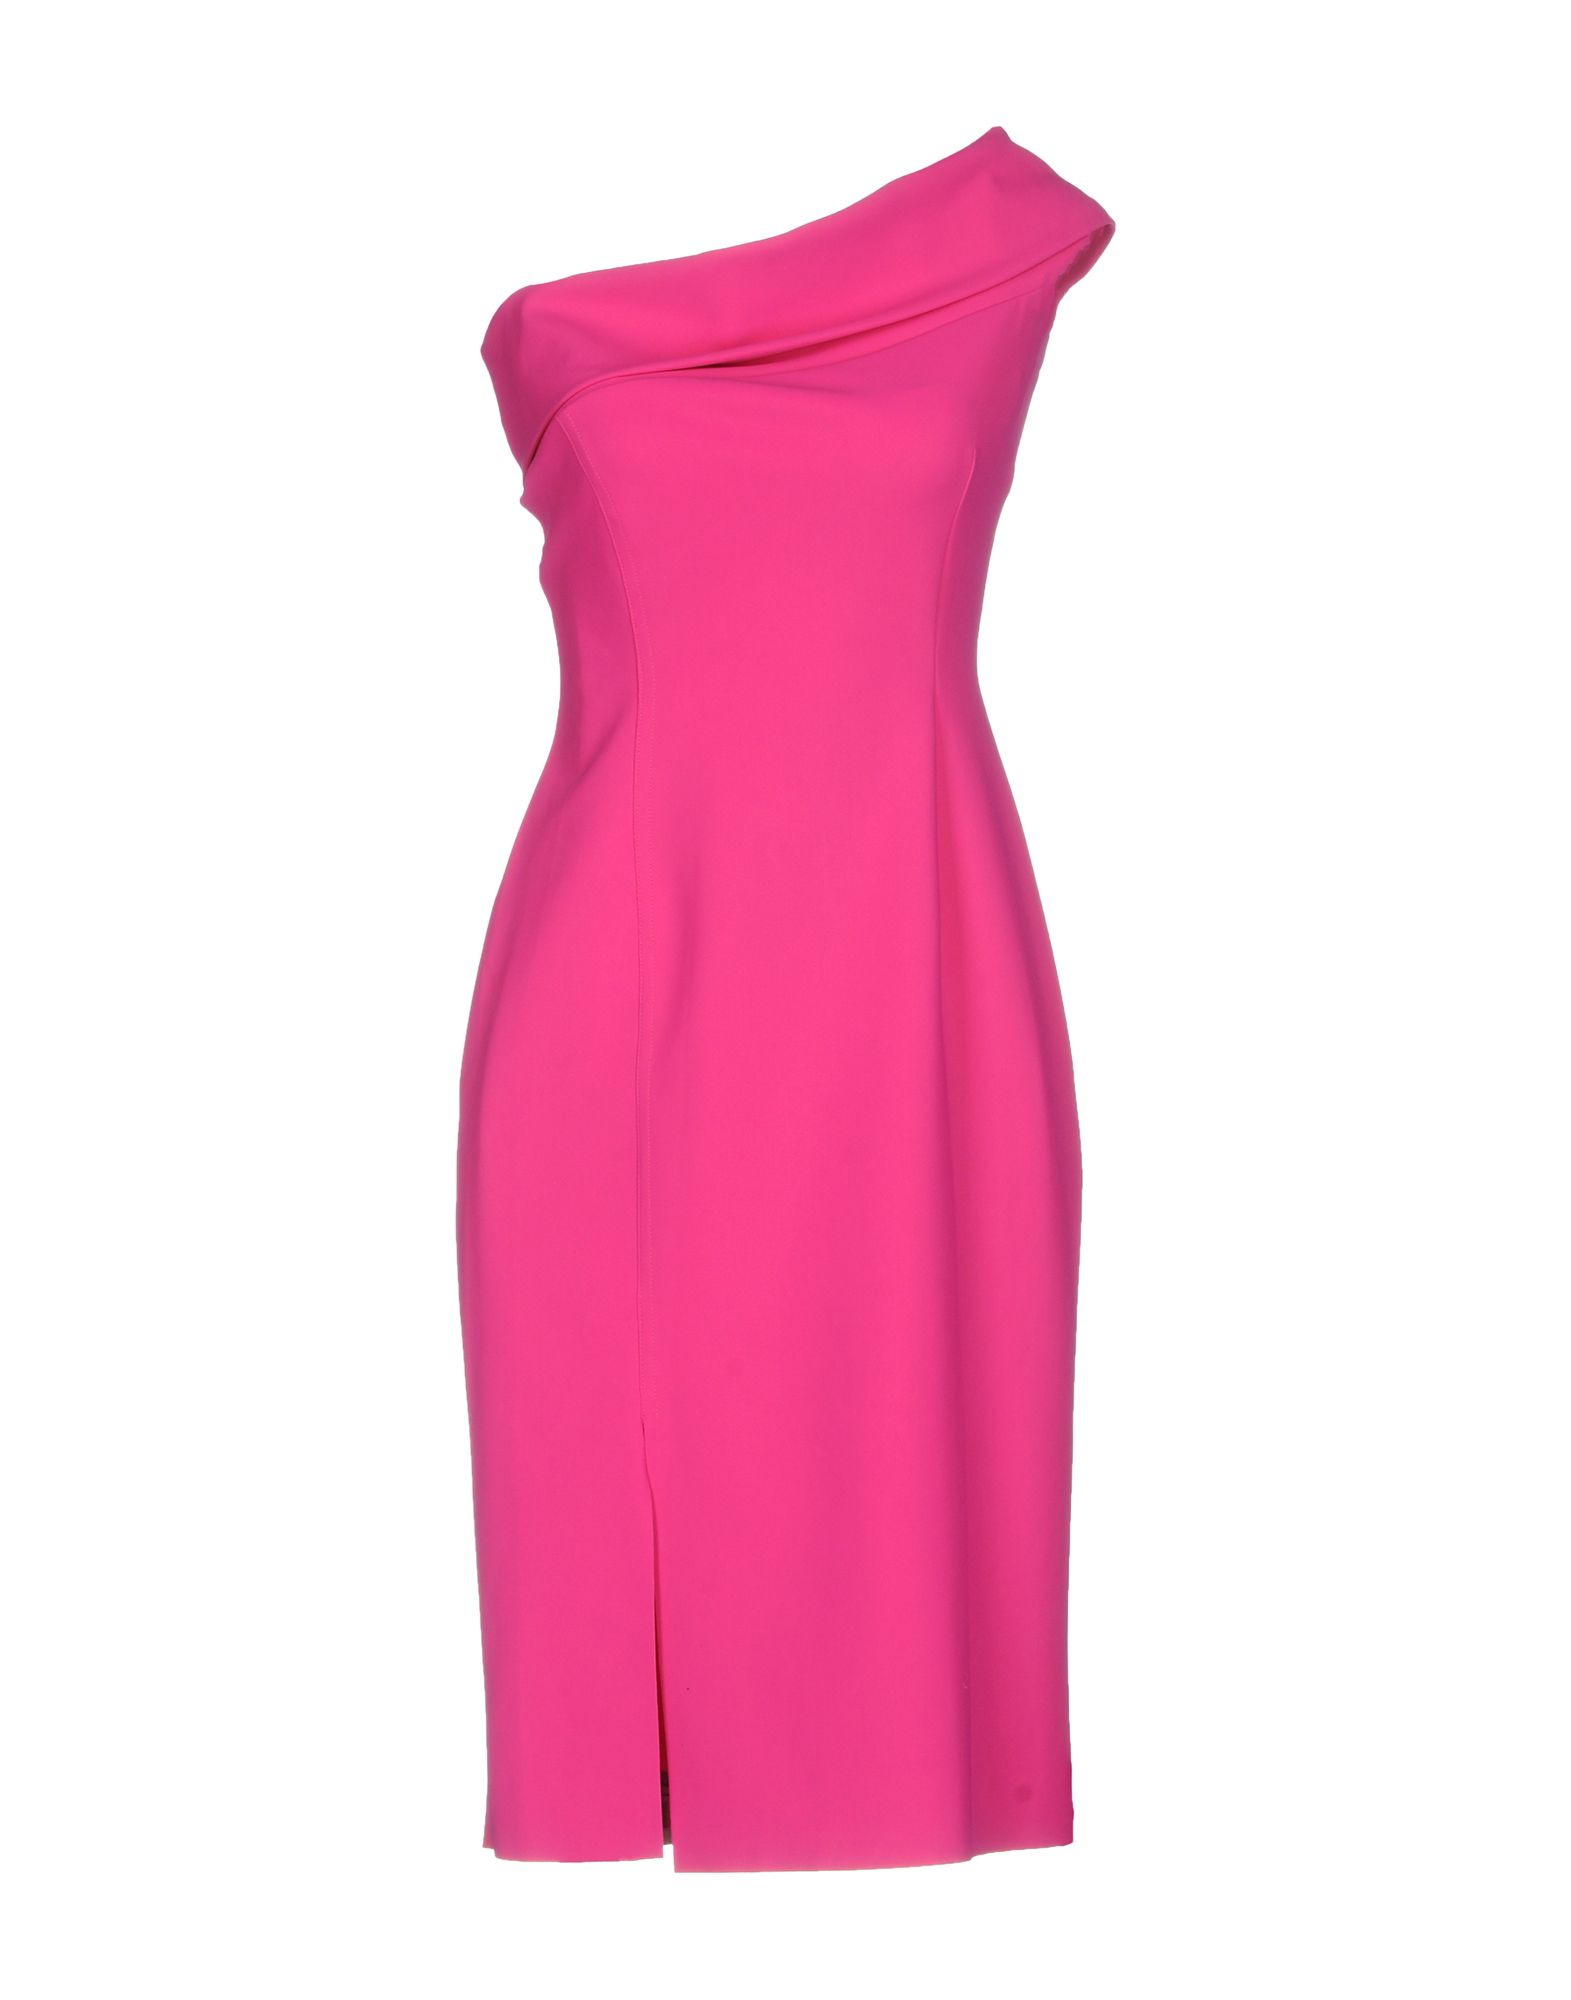 CHIARA BONI LA PETITE ROBE Damen Kurzes Kleid Farbe Fuchsia Größe 3